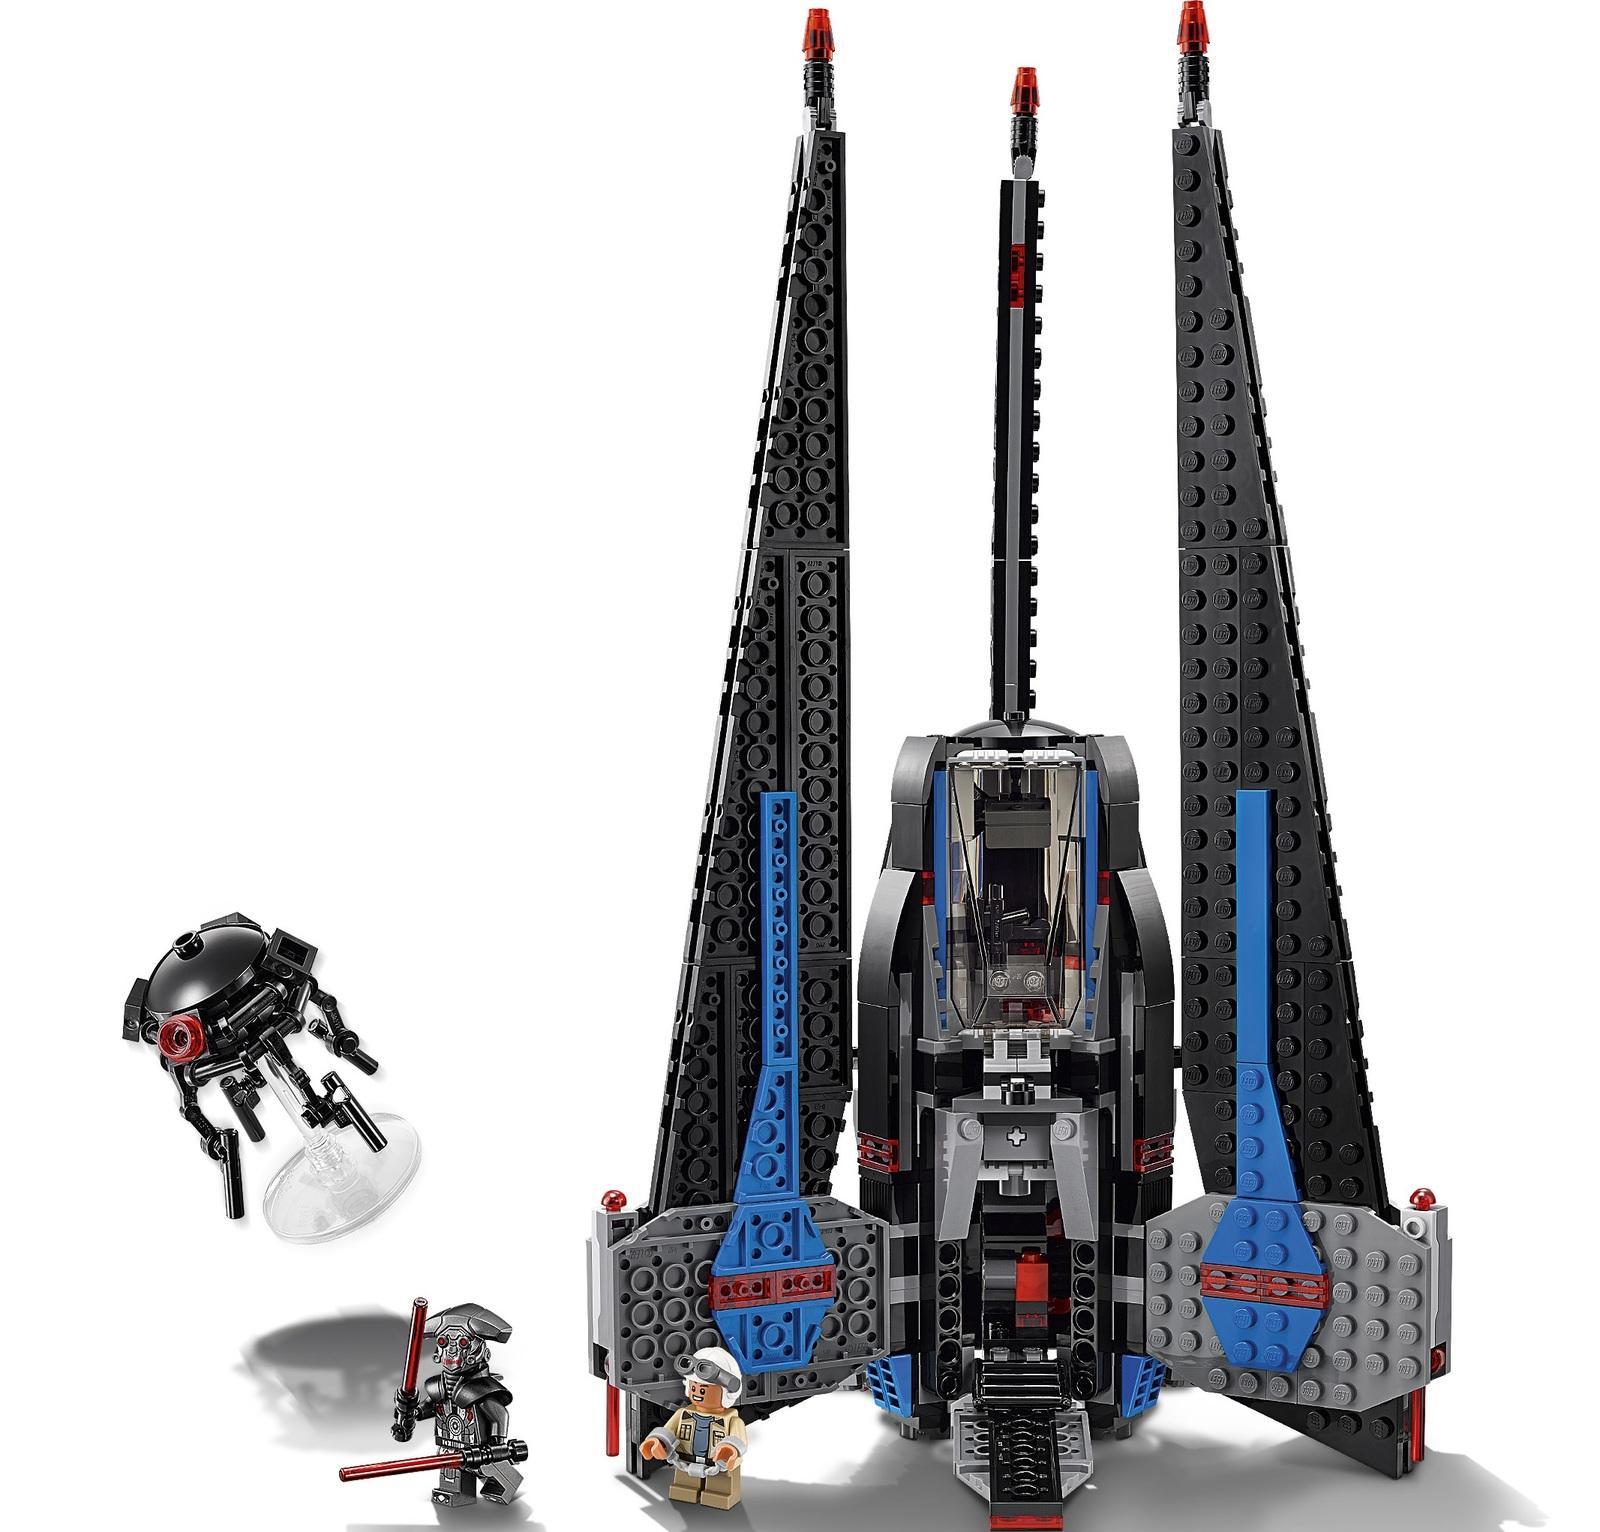 LEGO Star Wars - Tracker I (75185) image